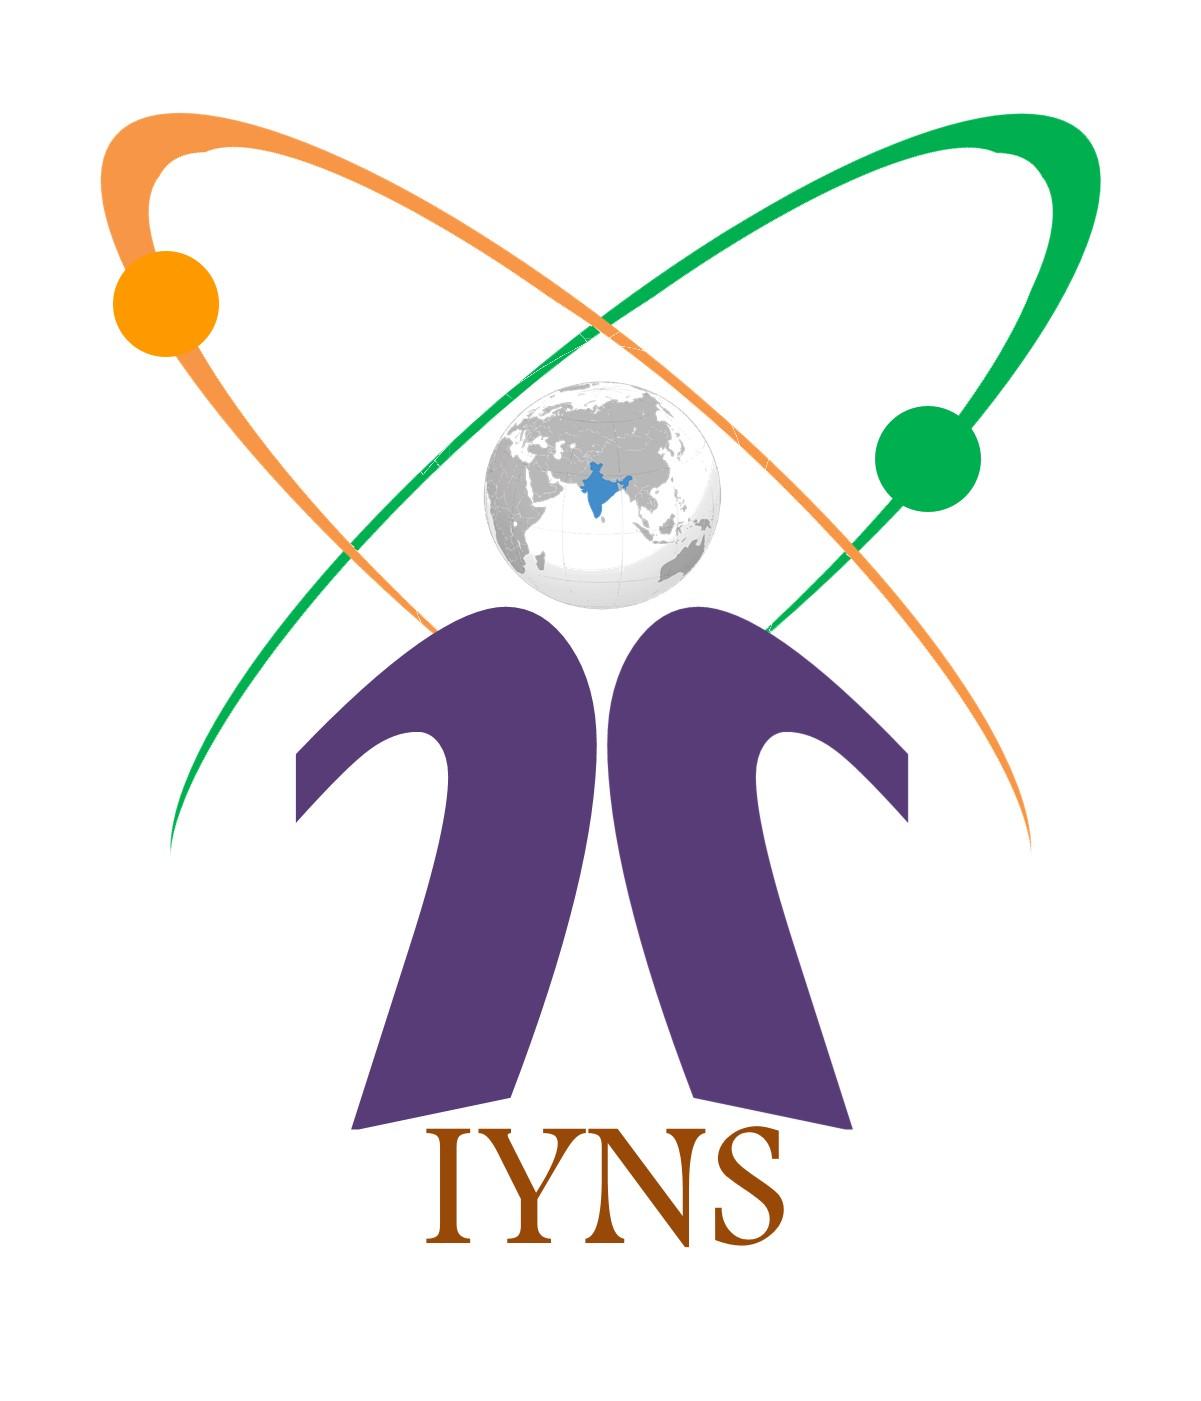 logo IYNS new